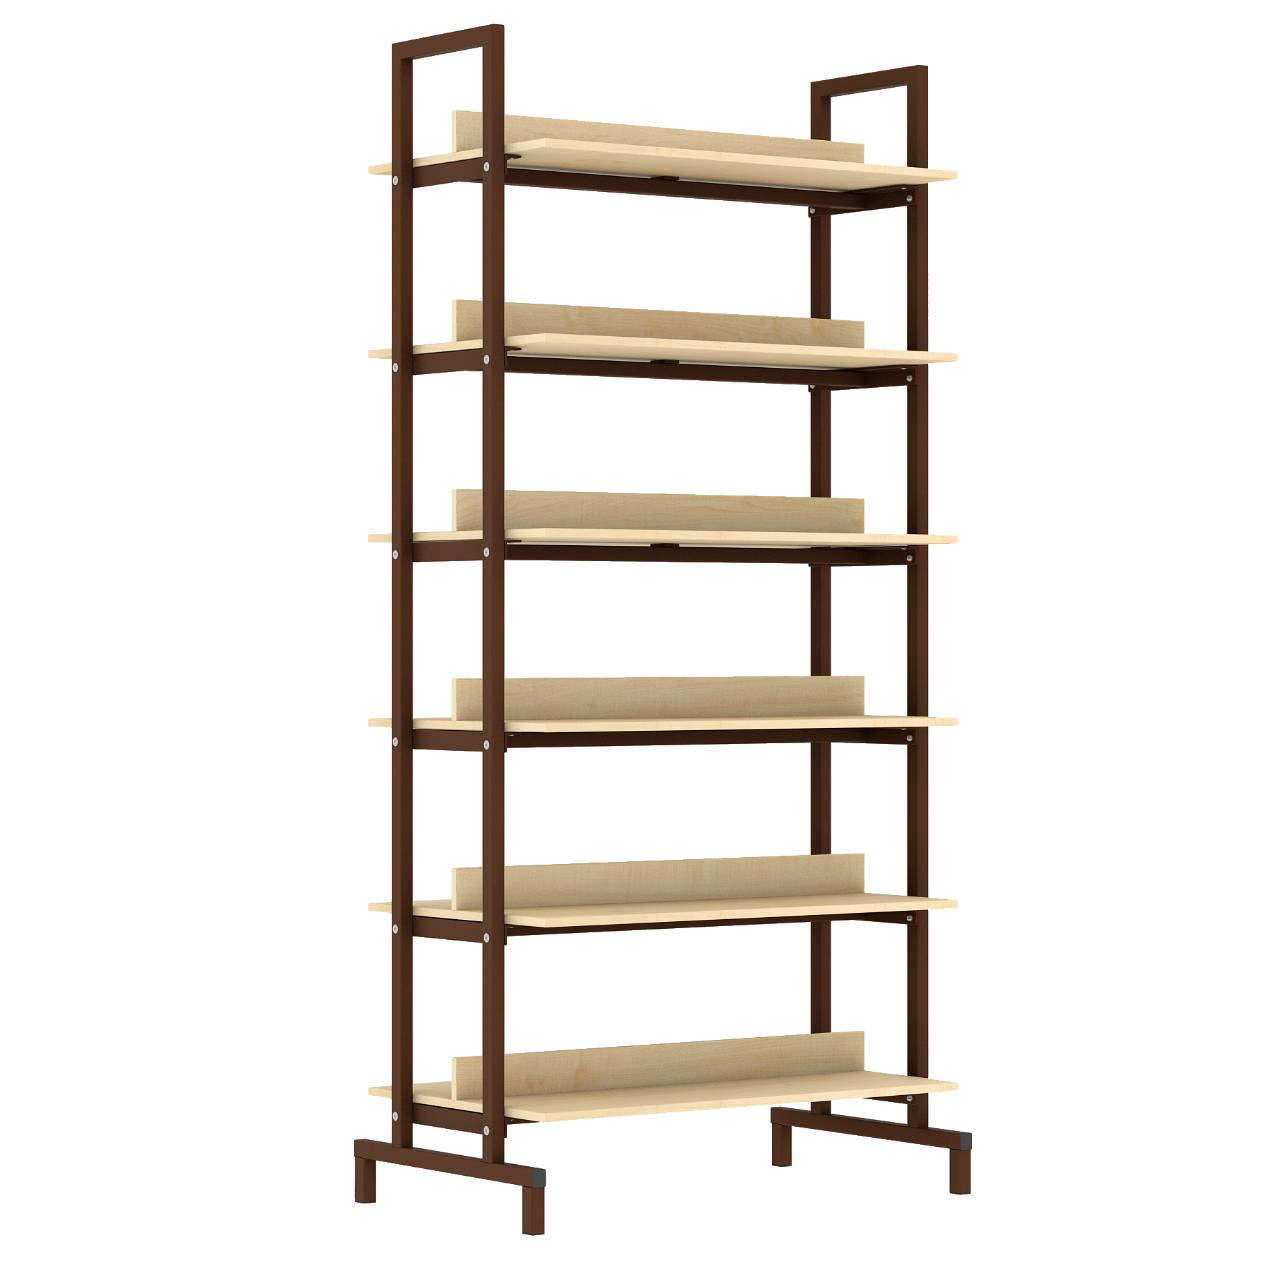 Стеллаж библиотечный 2-сторонний коричневый Клен Меламин